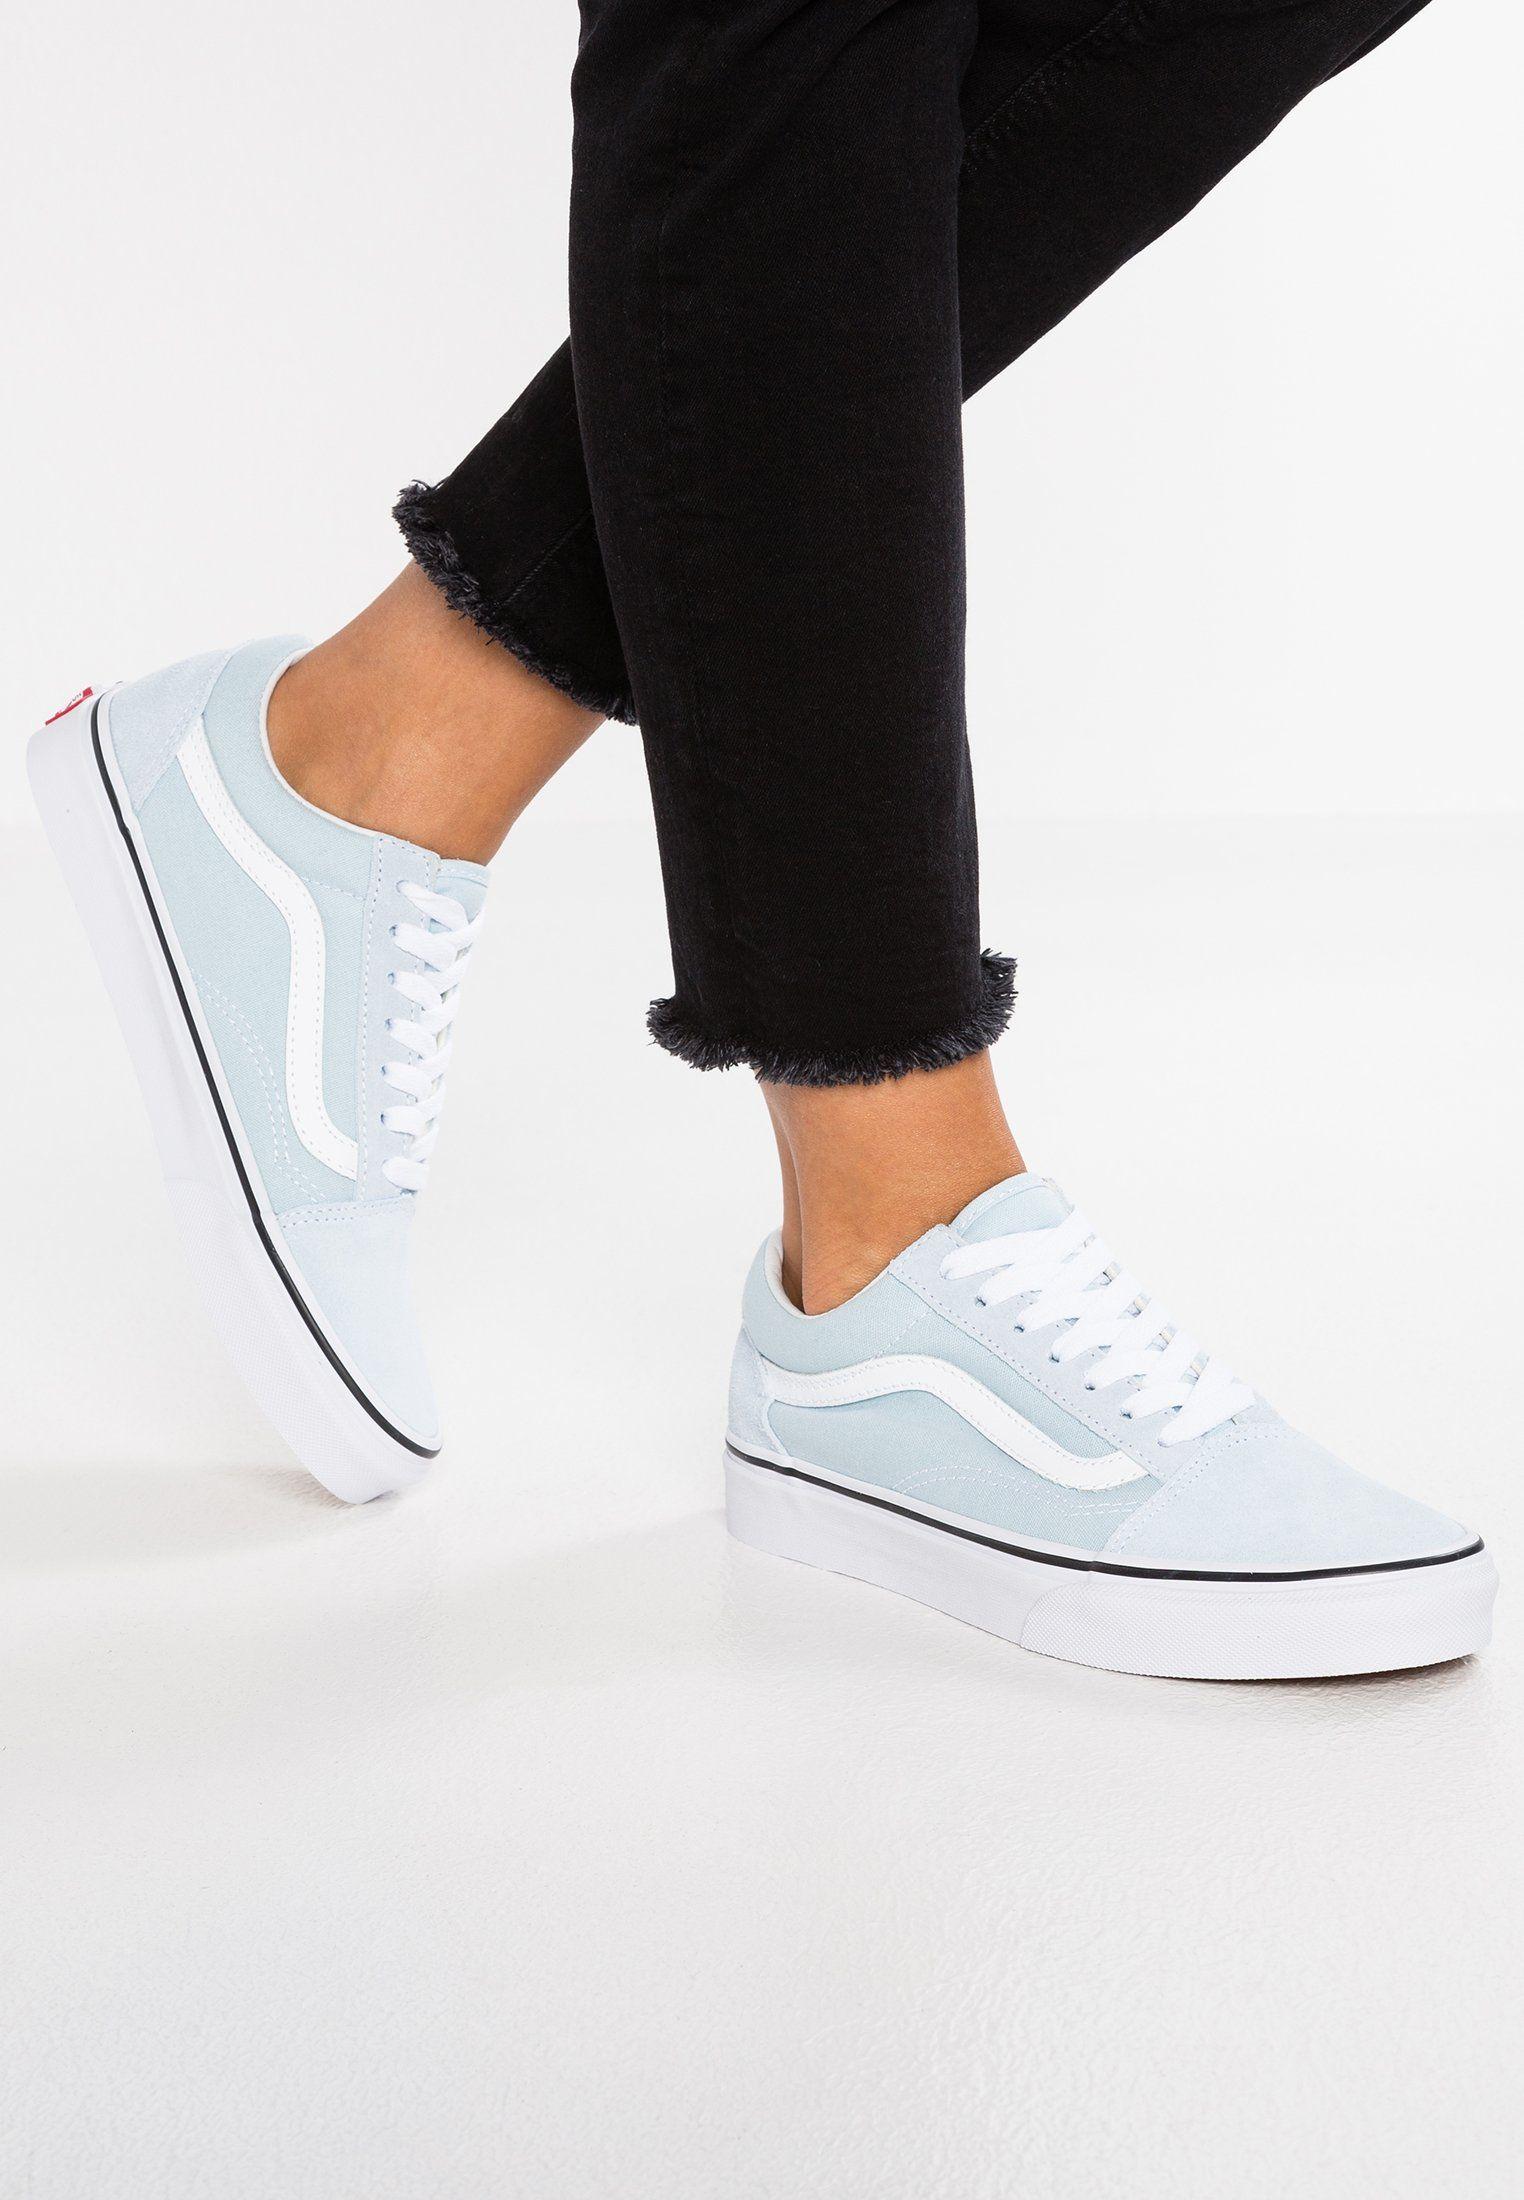 Vans Old Skool Sneaker Low Baby Blue True White Zalando De Sneakers Trendy Shoes Baby Blue Outfit